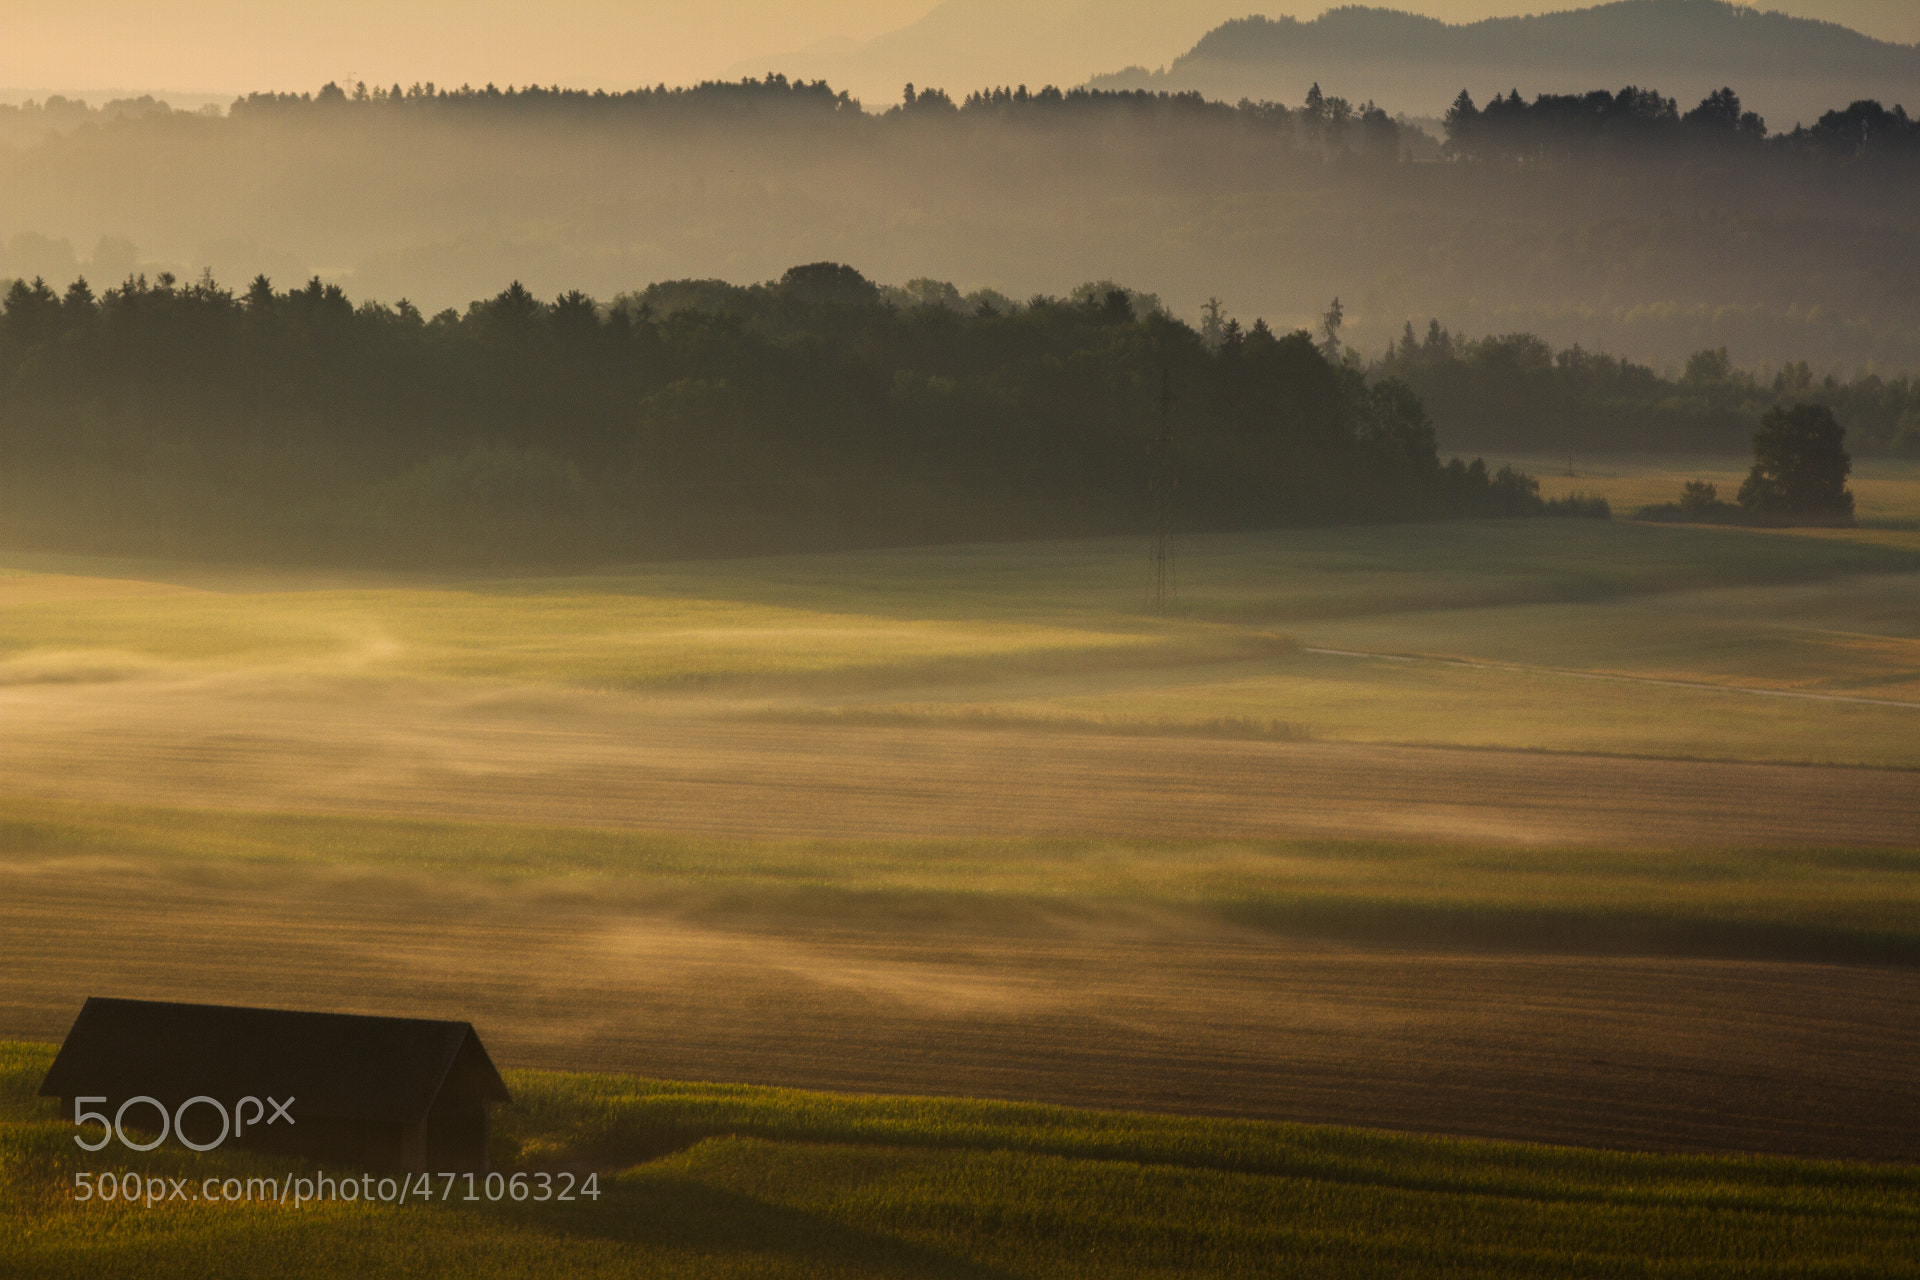 Photograph somewhere in Austria by Lazar Ovidiu on 500px